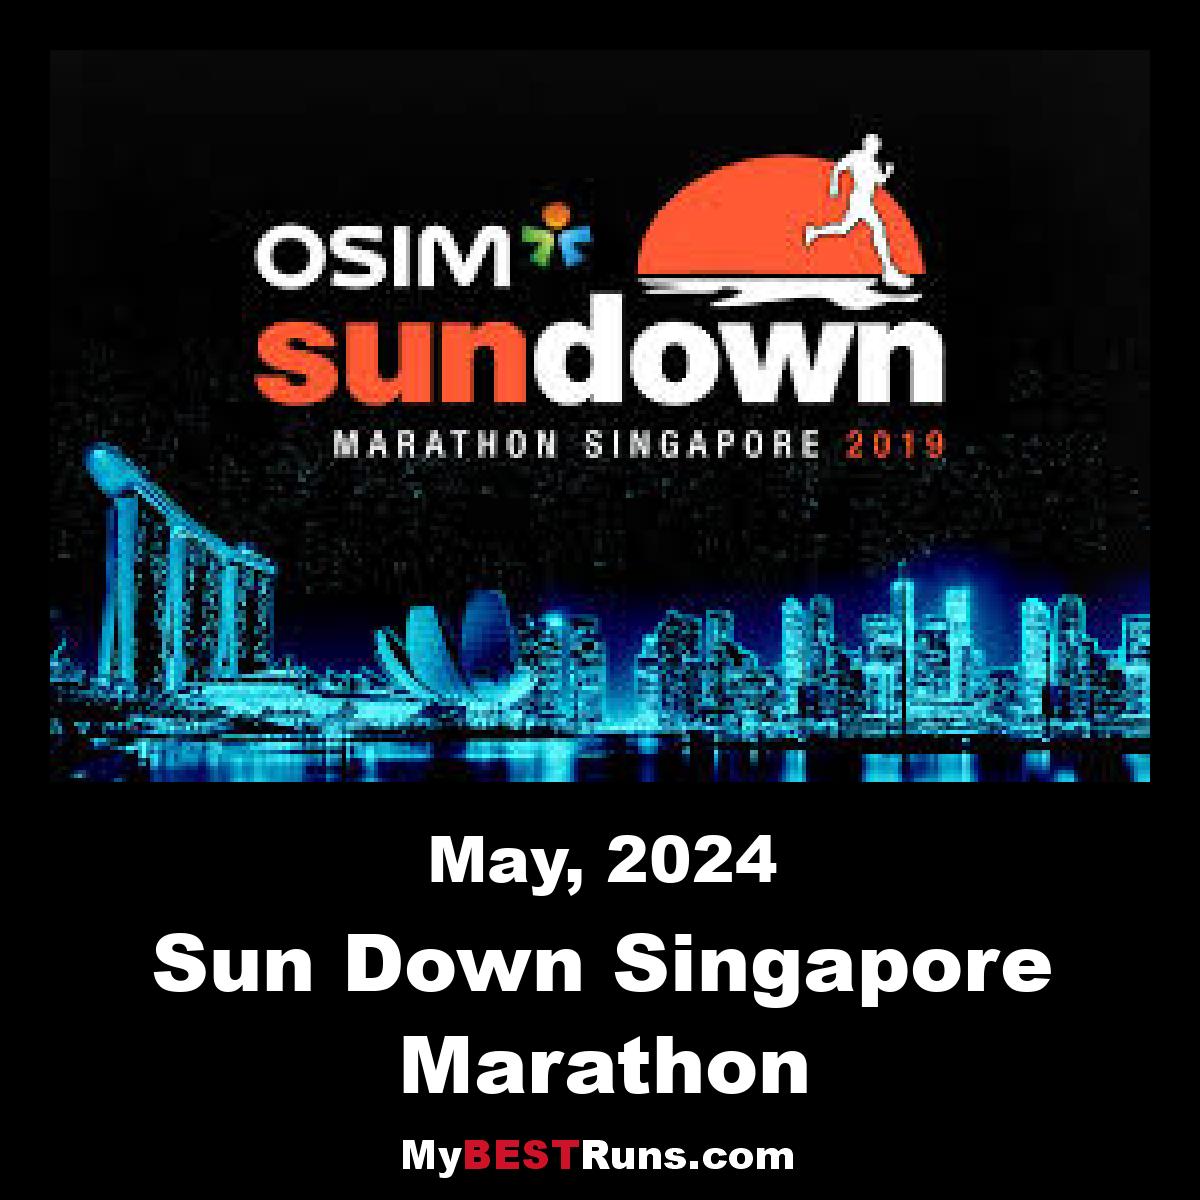 Sun Down Singapore Marathon